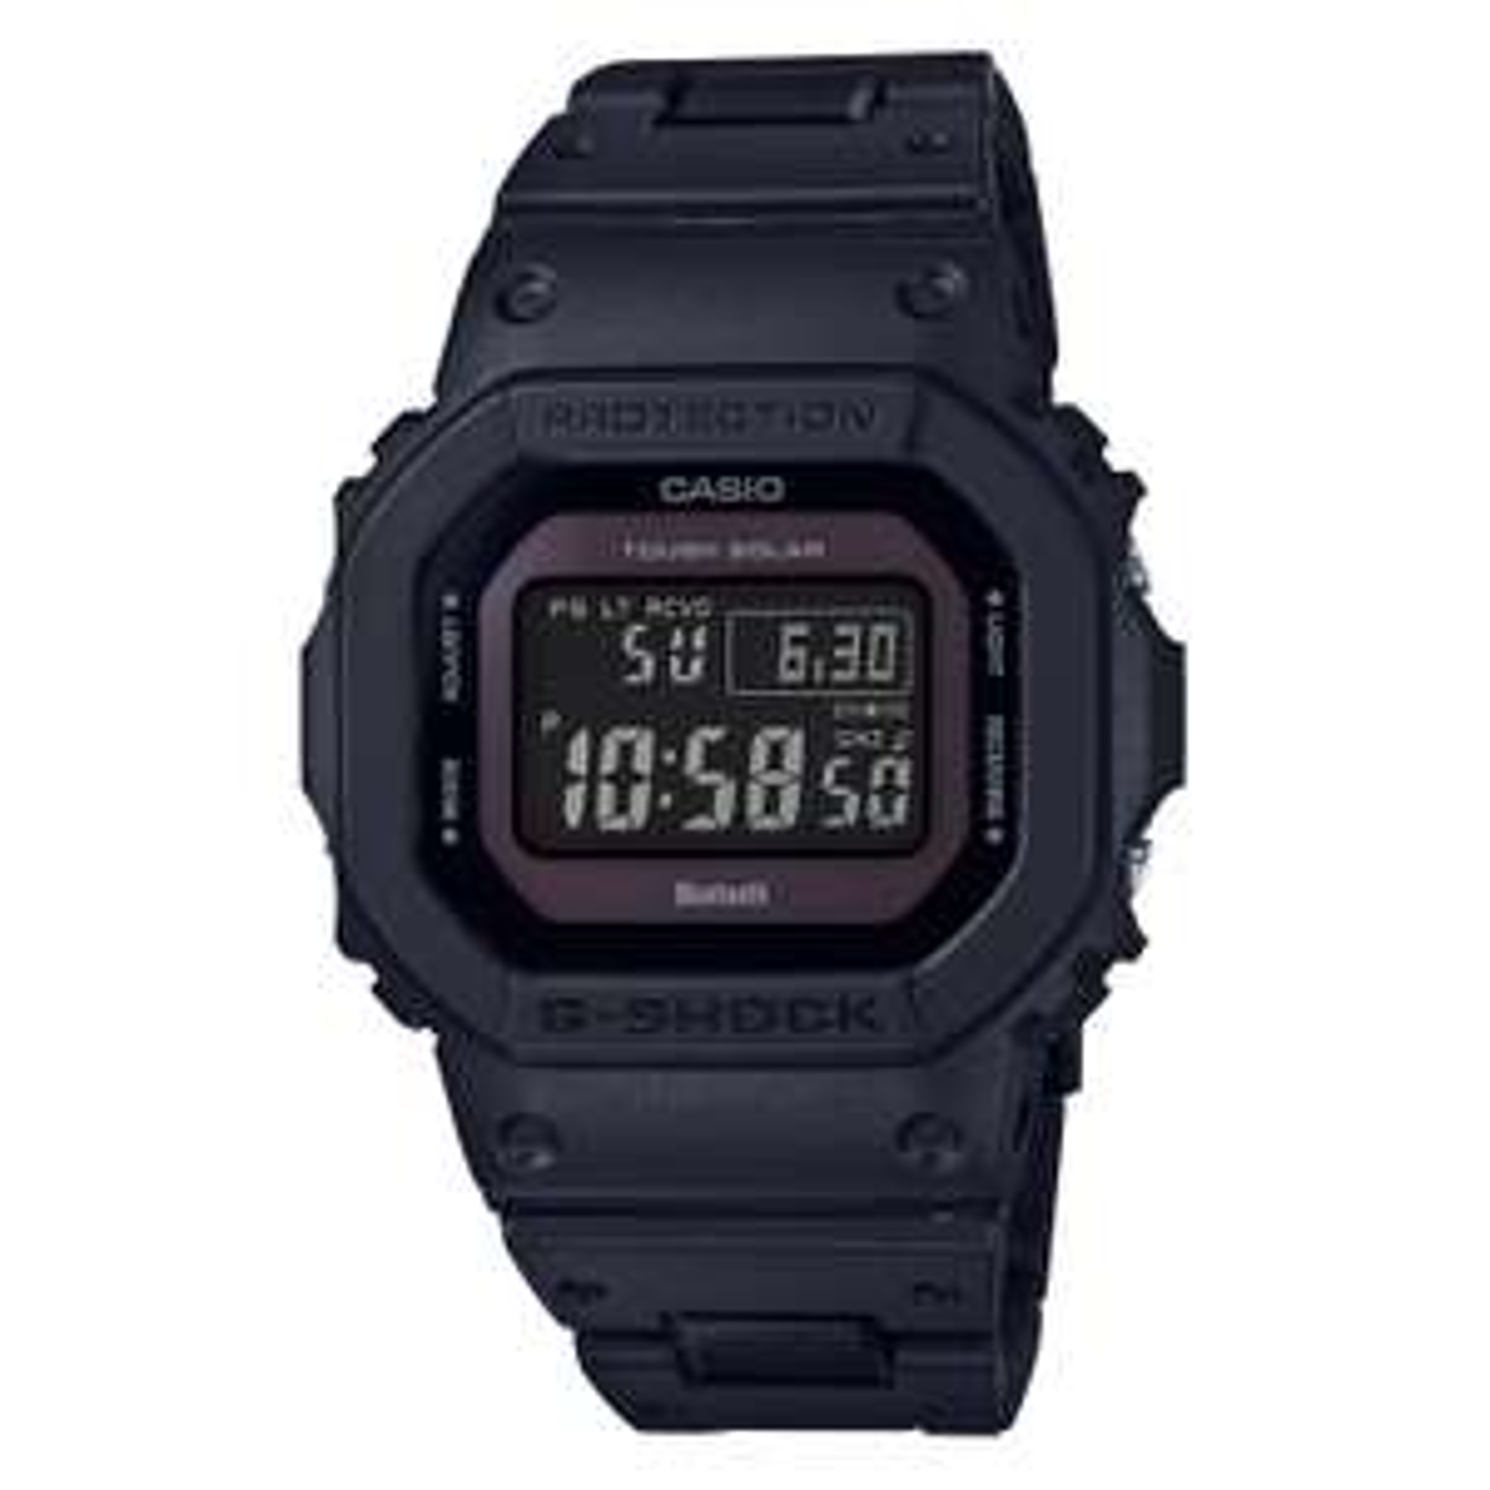 Casio G-Shock Watch - GW-B5600BC-1BER - £89 (With Code) @ H Samuel